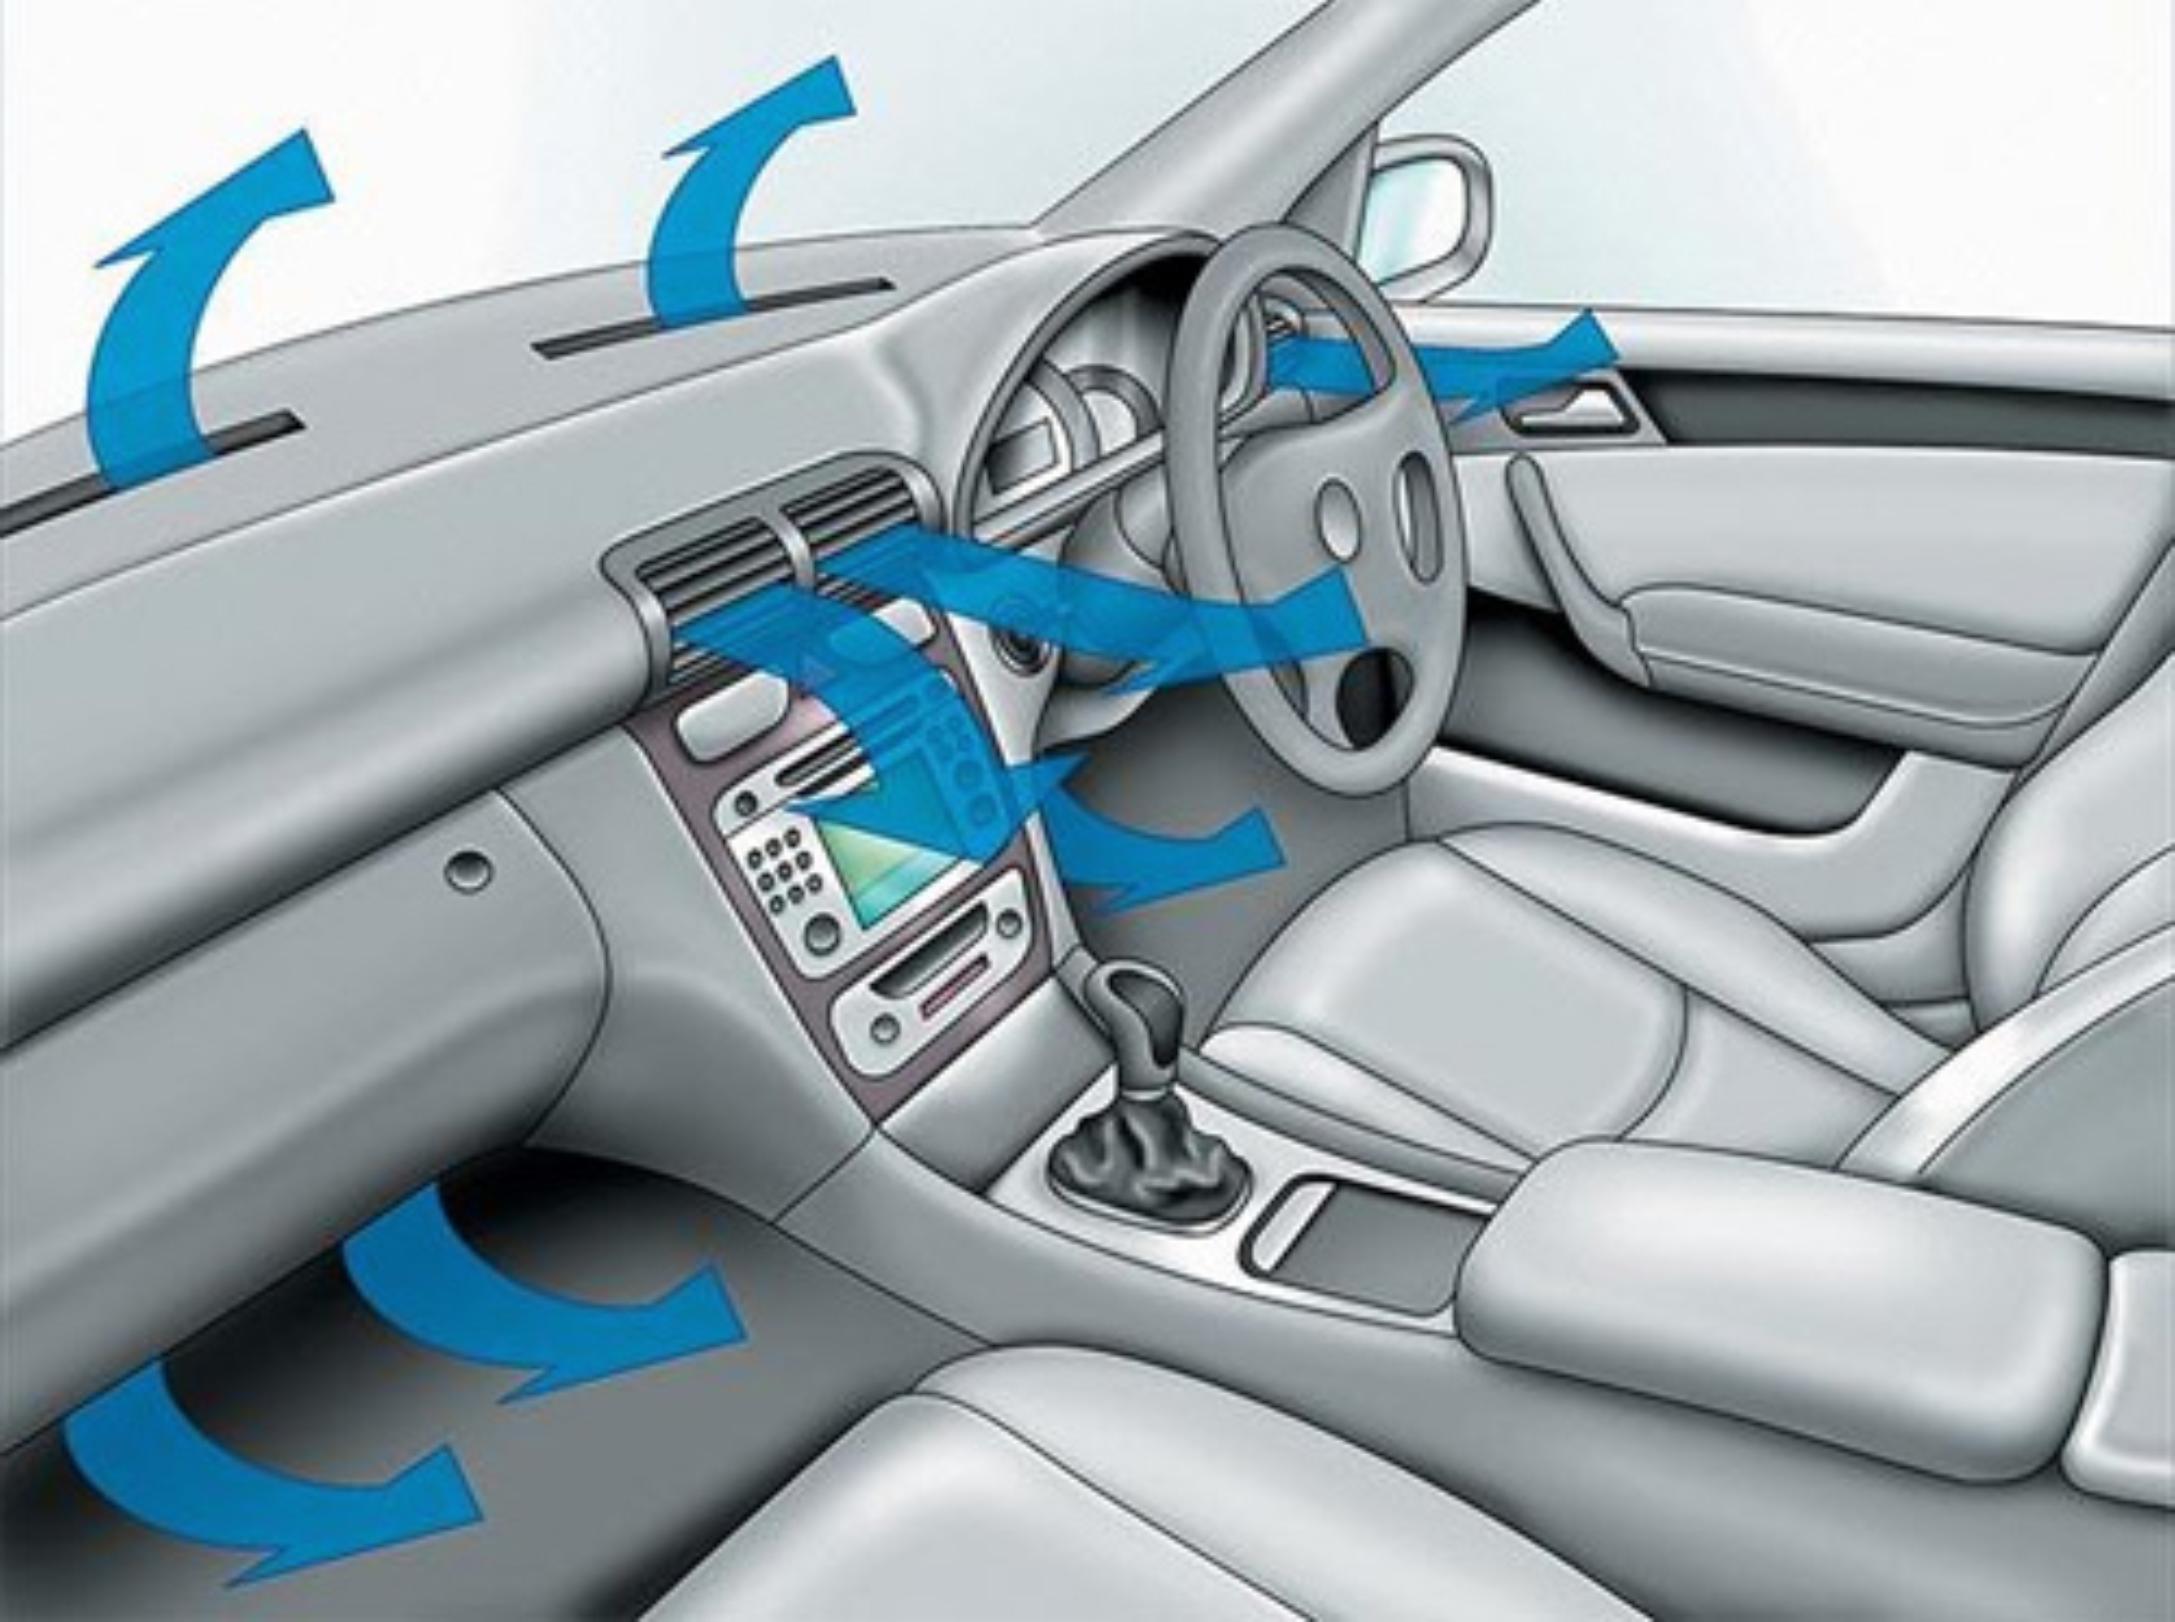 Циркуляция воздуха в автомобиле